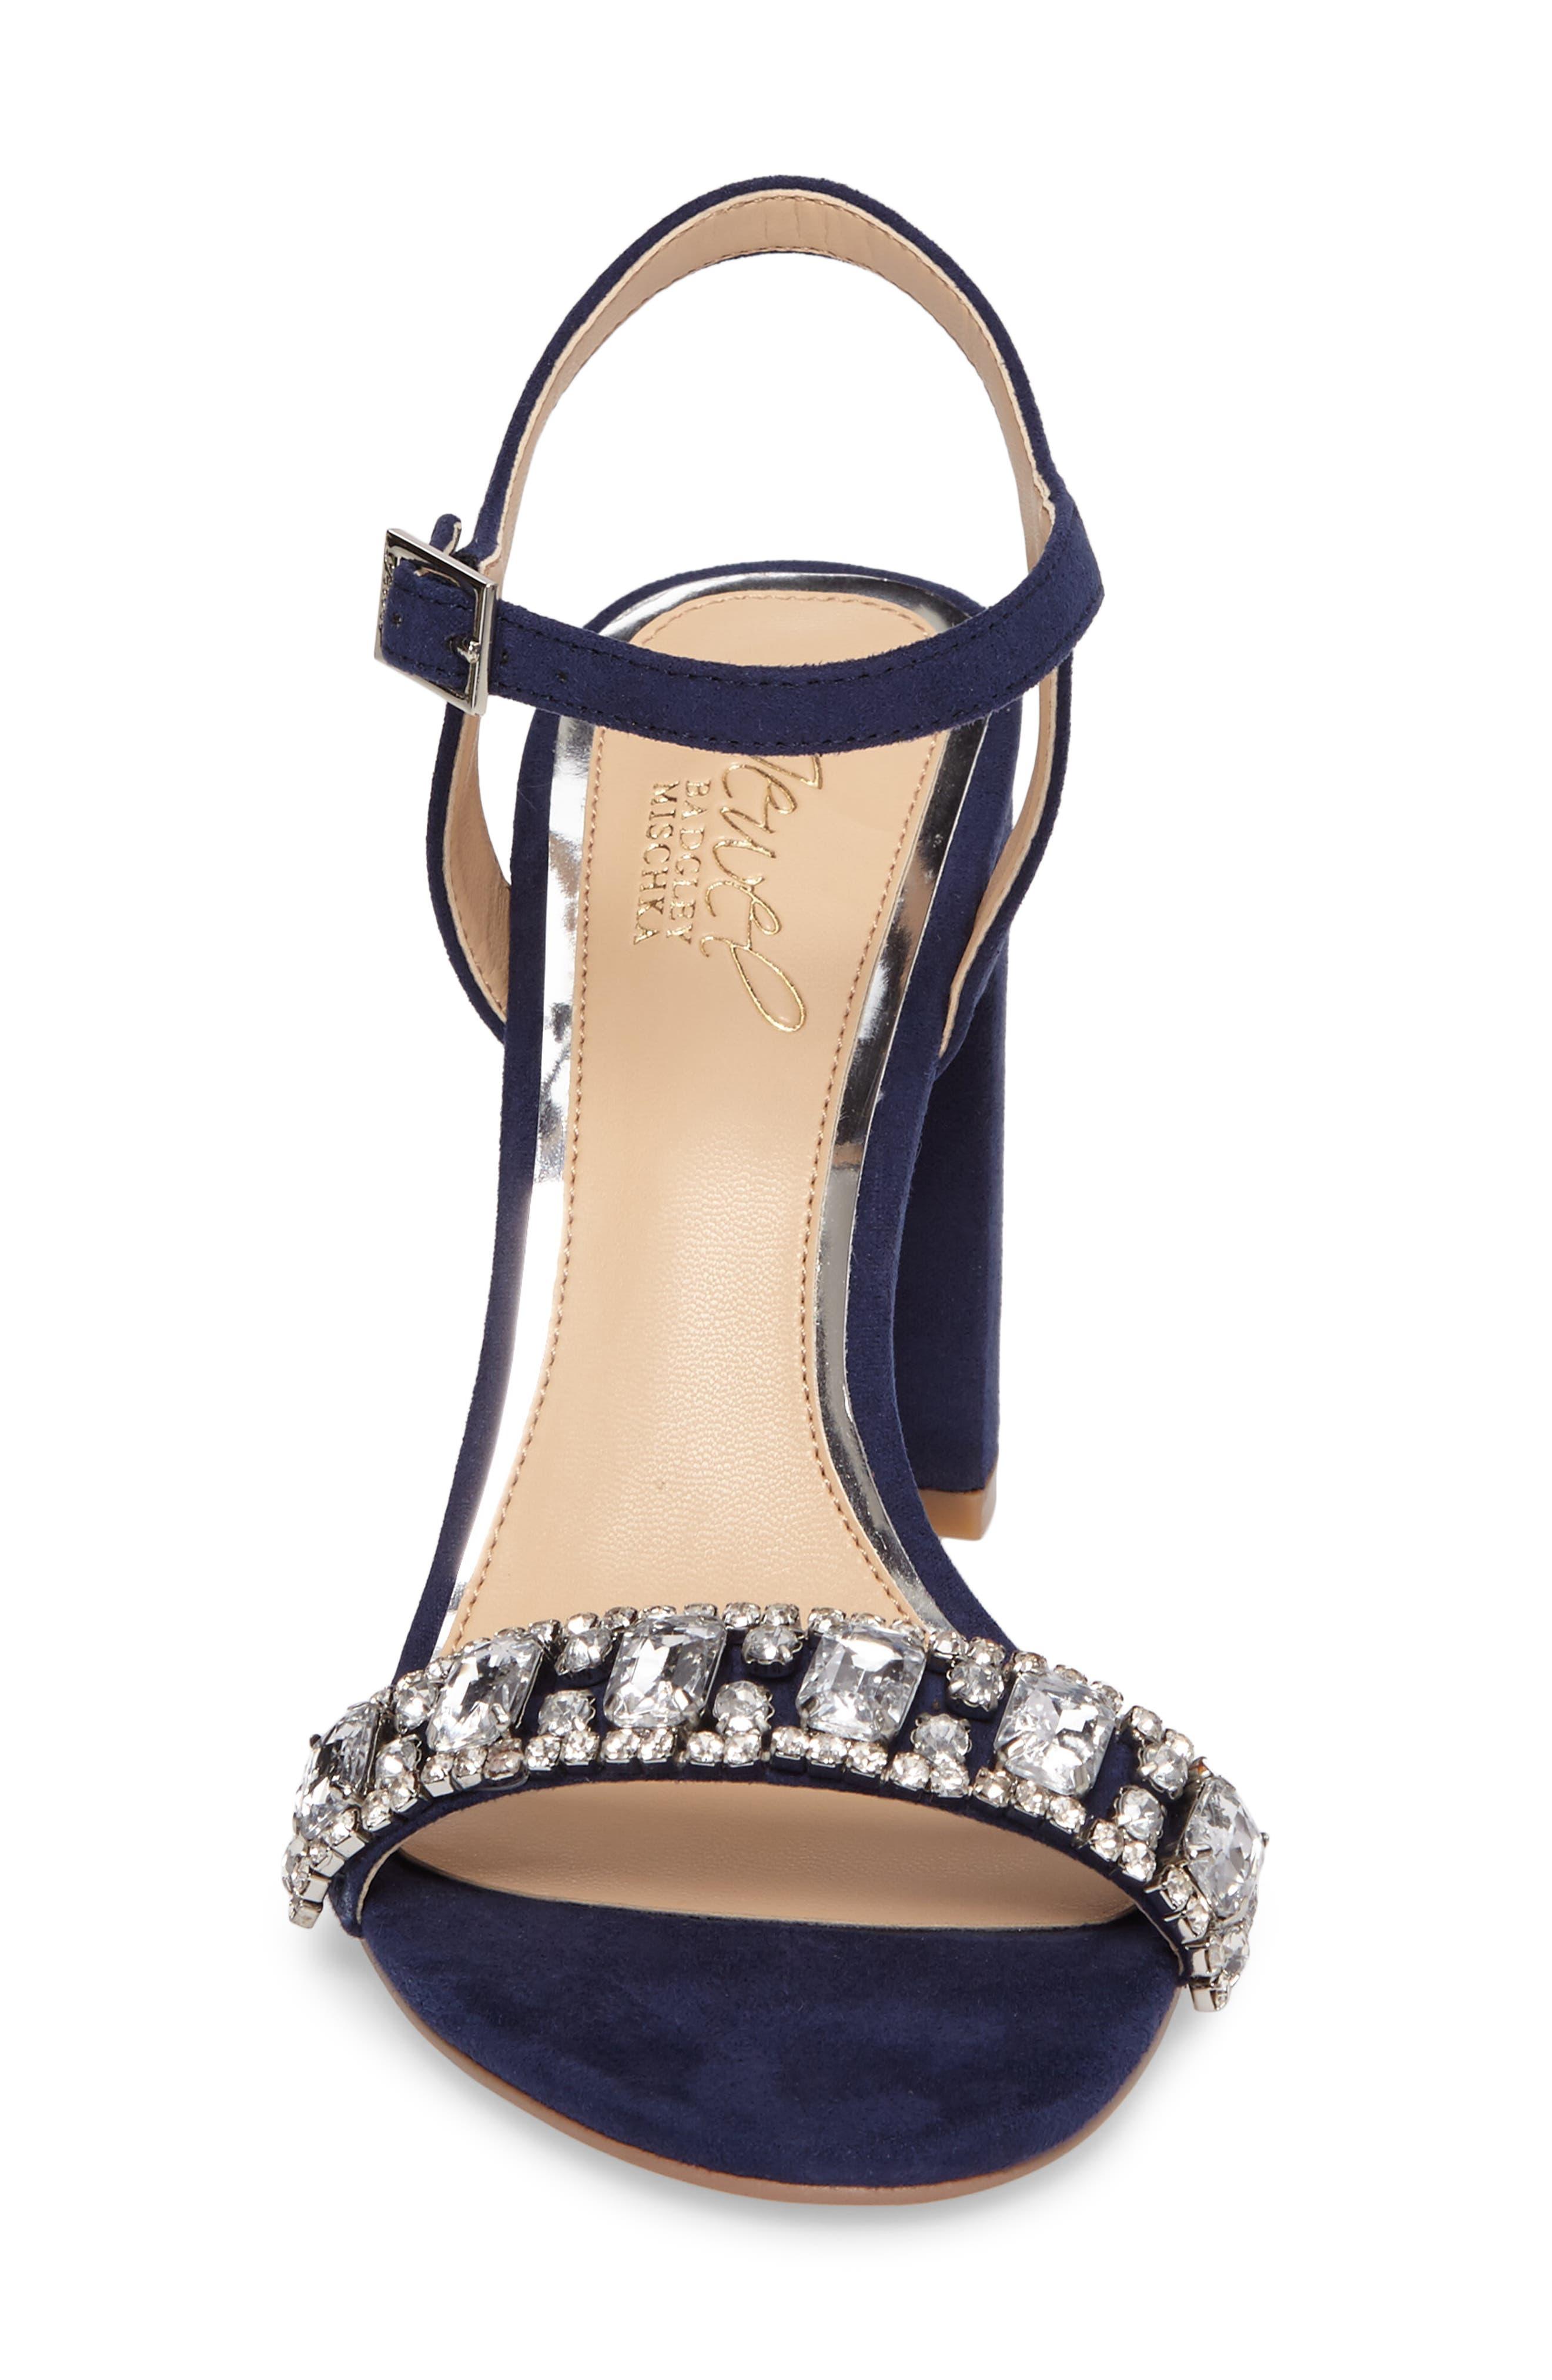 Hendricks Embellished Block Heel Sandal,                             Alternate thumbnail 4, color,                             Navy Suede